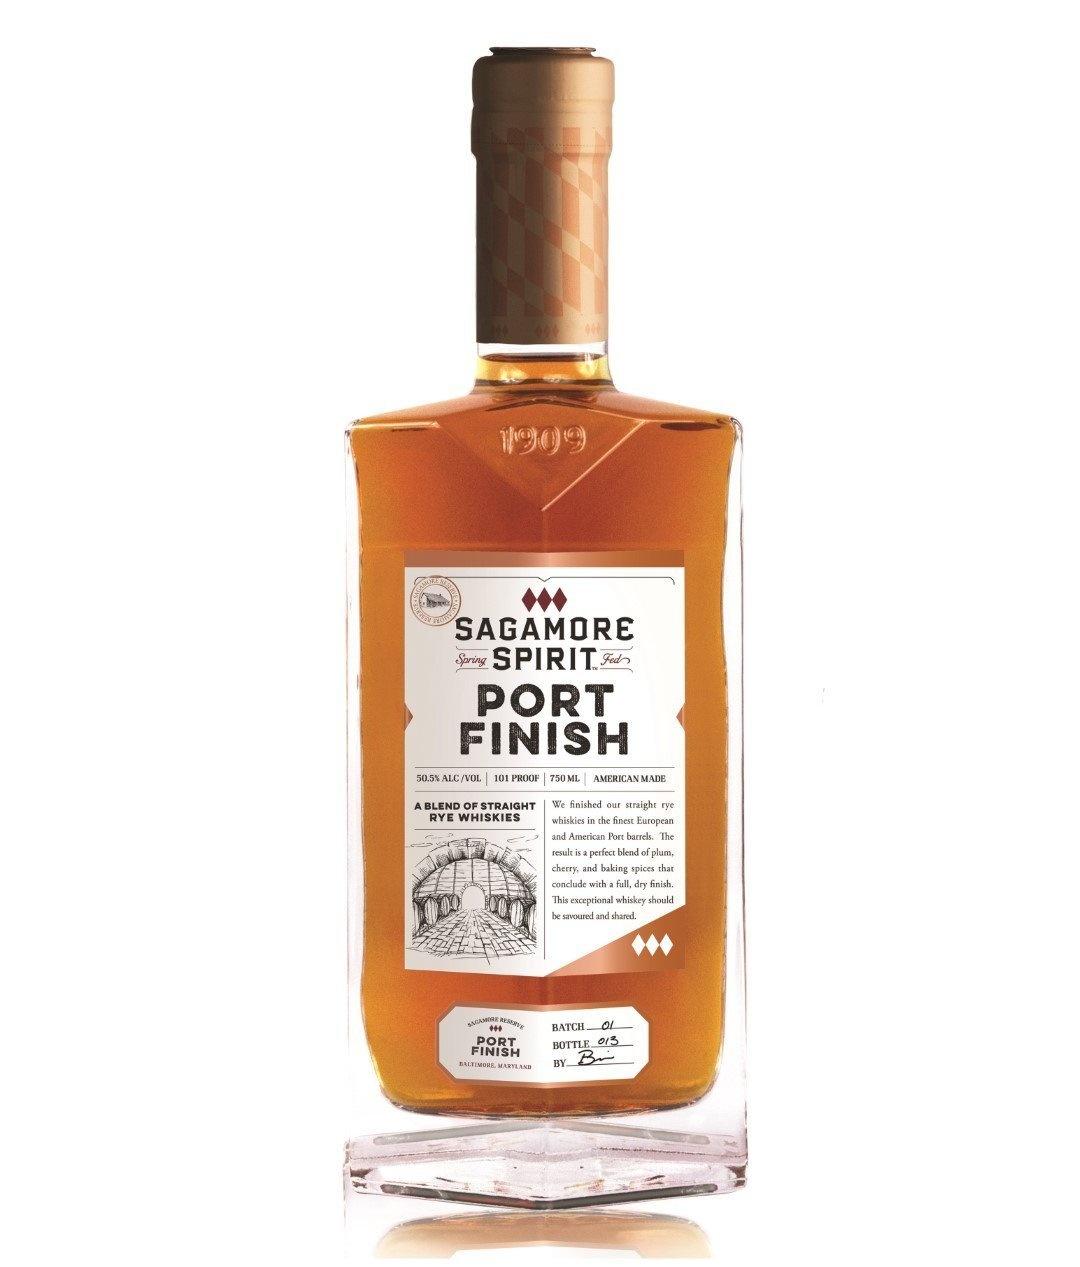 Sagamore Spirit Spring Fed Port Finish Blend Of Rye Whiskies 101Pf. 750ml